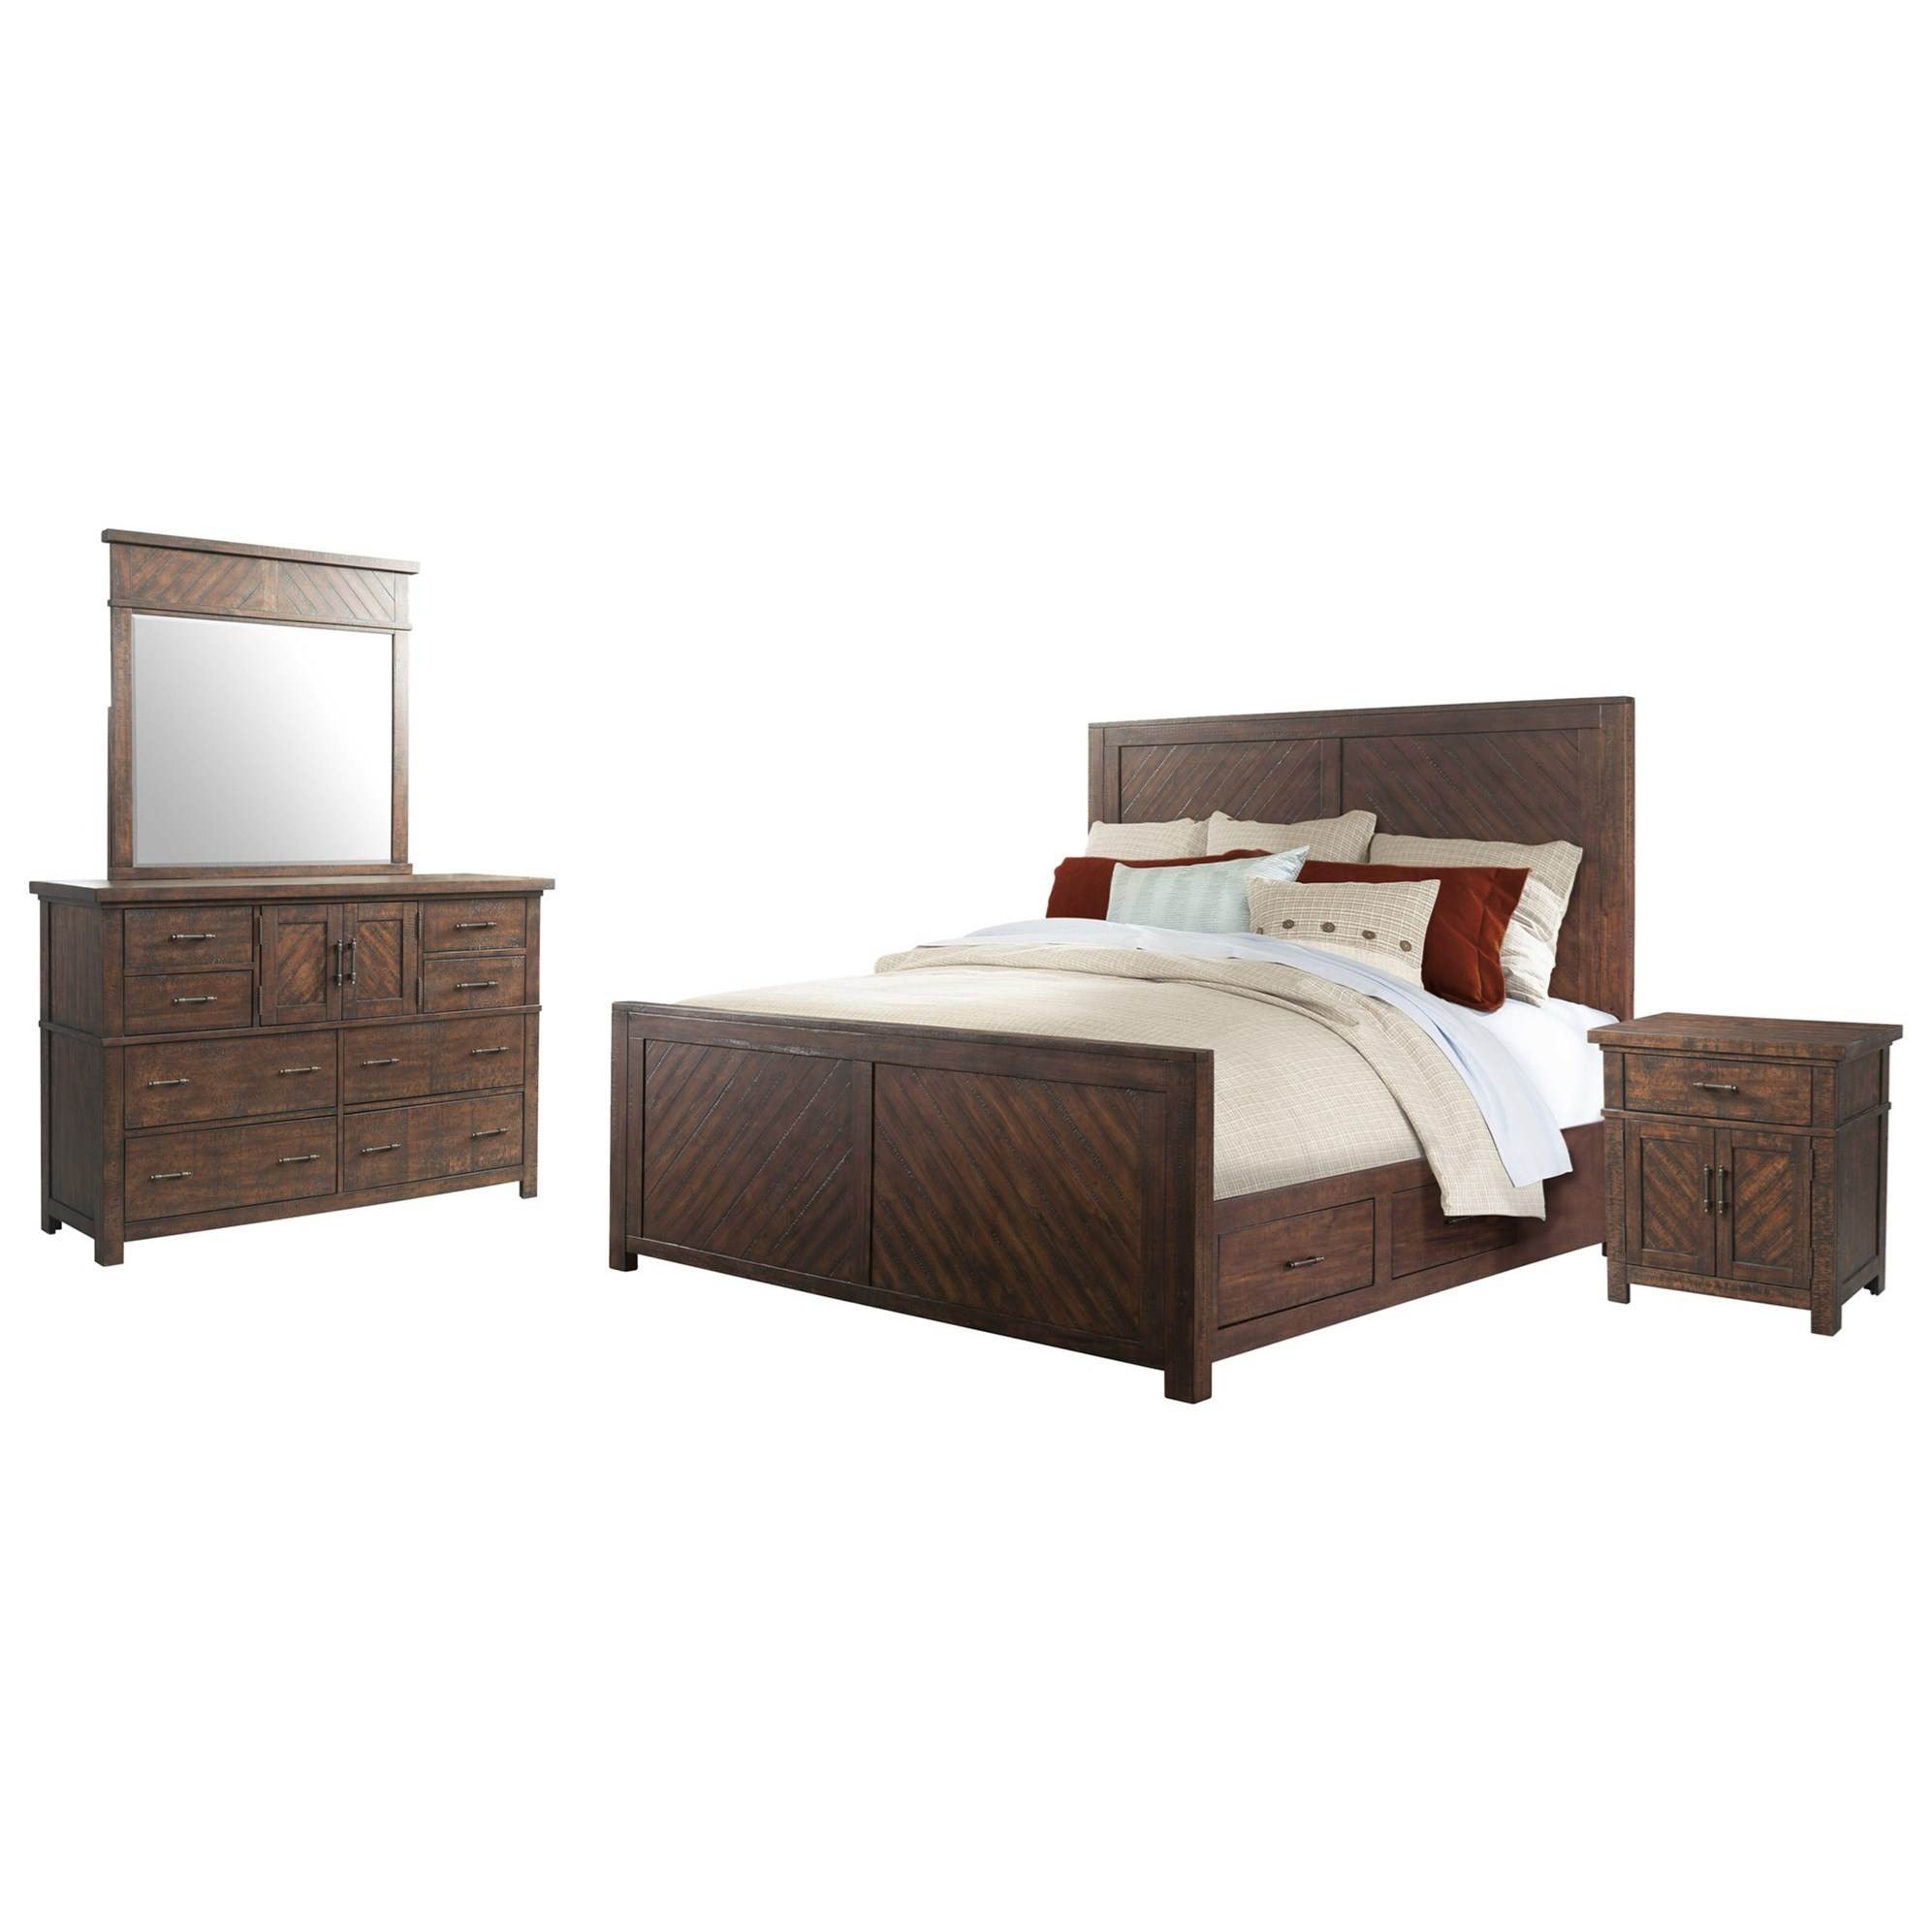 Jax 4-Piece Queen Bedroom Set by VFM Basics at Virginia Furniture Market